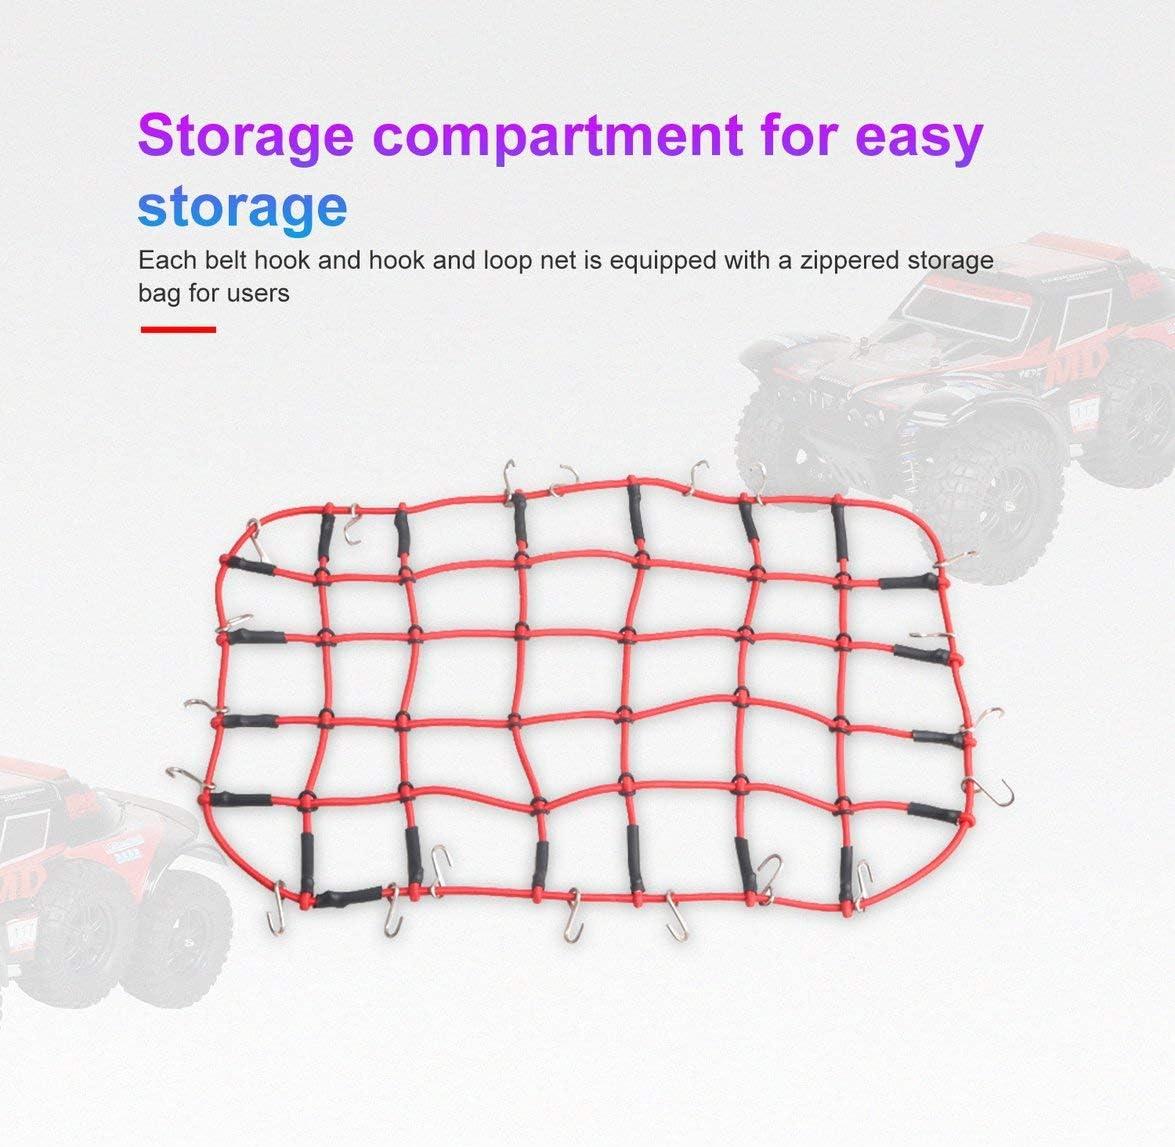 Sylvialuca Gep/äcknetz Mesh Storage Gep/äck Fracht Gep/äck Dachgep/äcktr/äger Net Dekorative Accessoires F/ür 1//10 RC Auto Crawler D90 Traxxas TRX-4